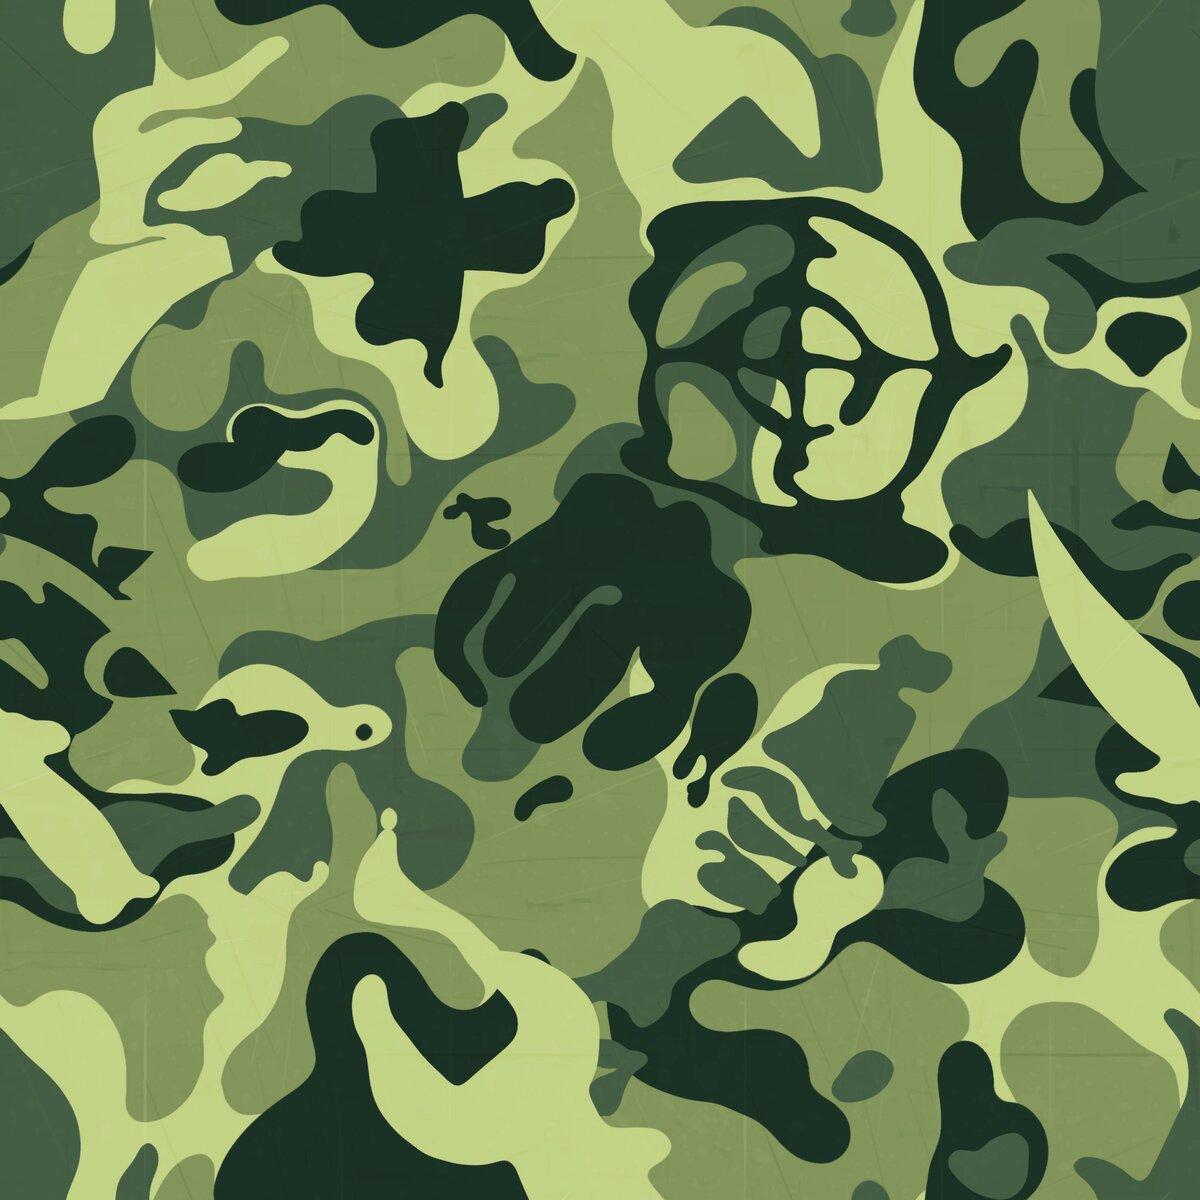 23 февраля открытка милитари, учебе картинки картинки